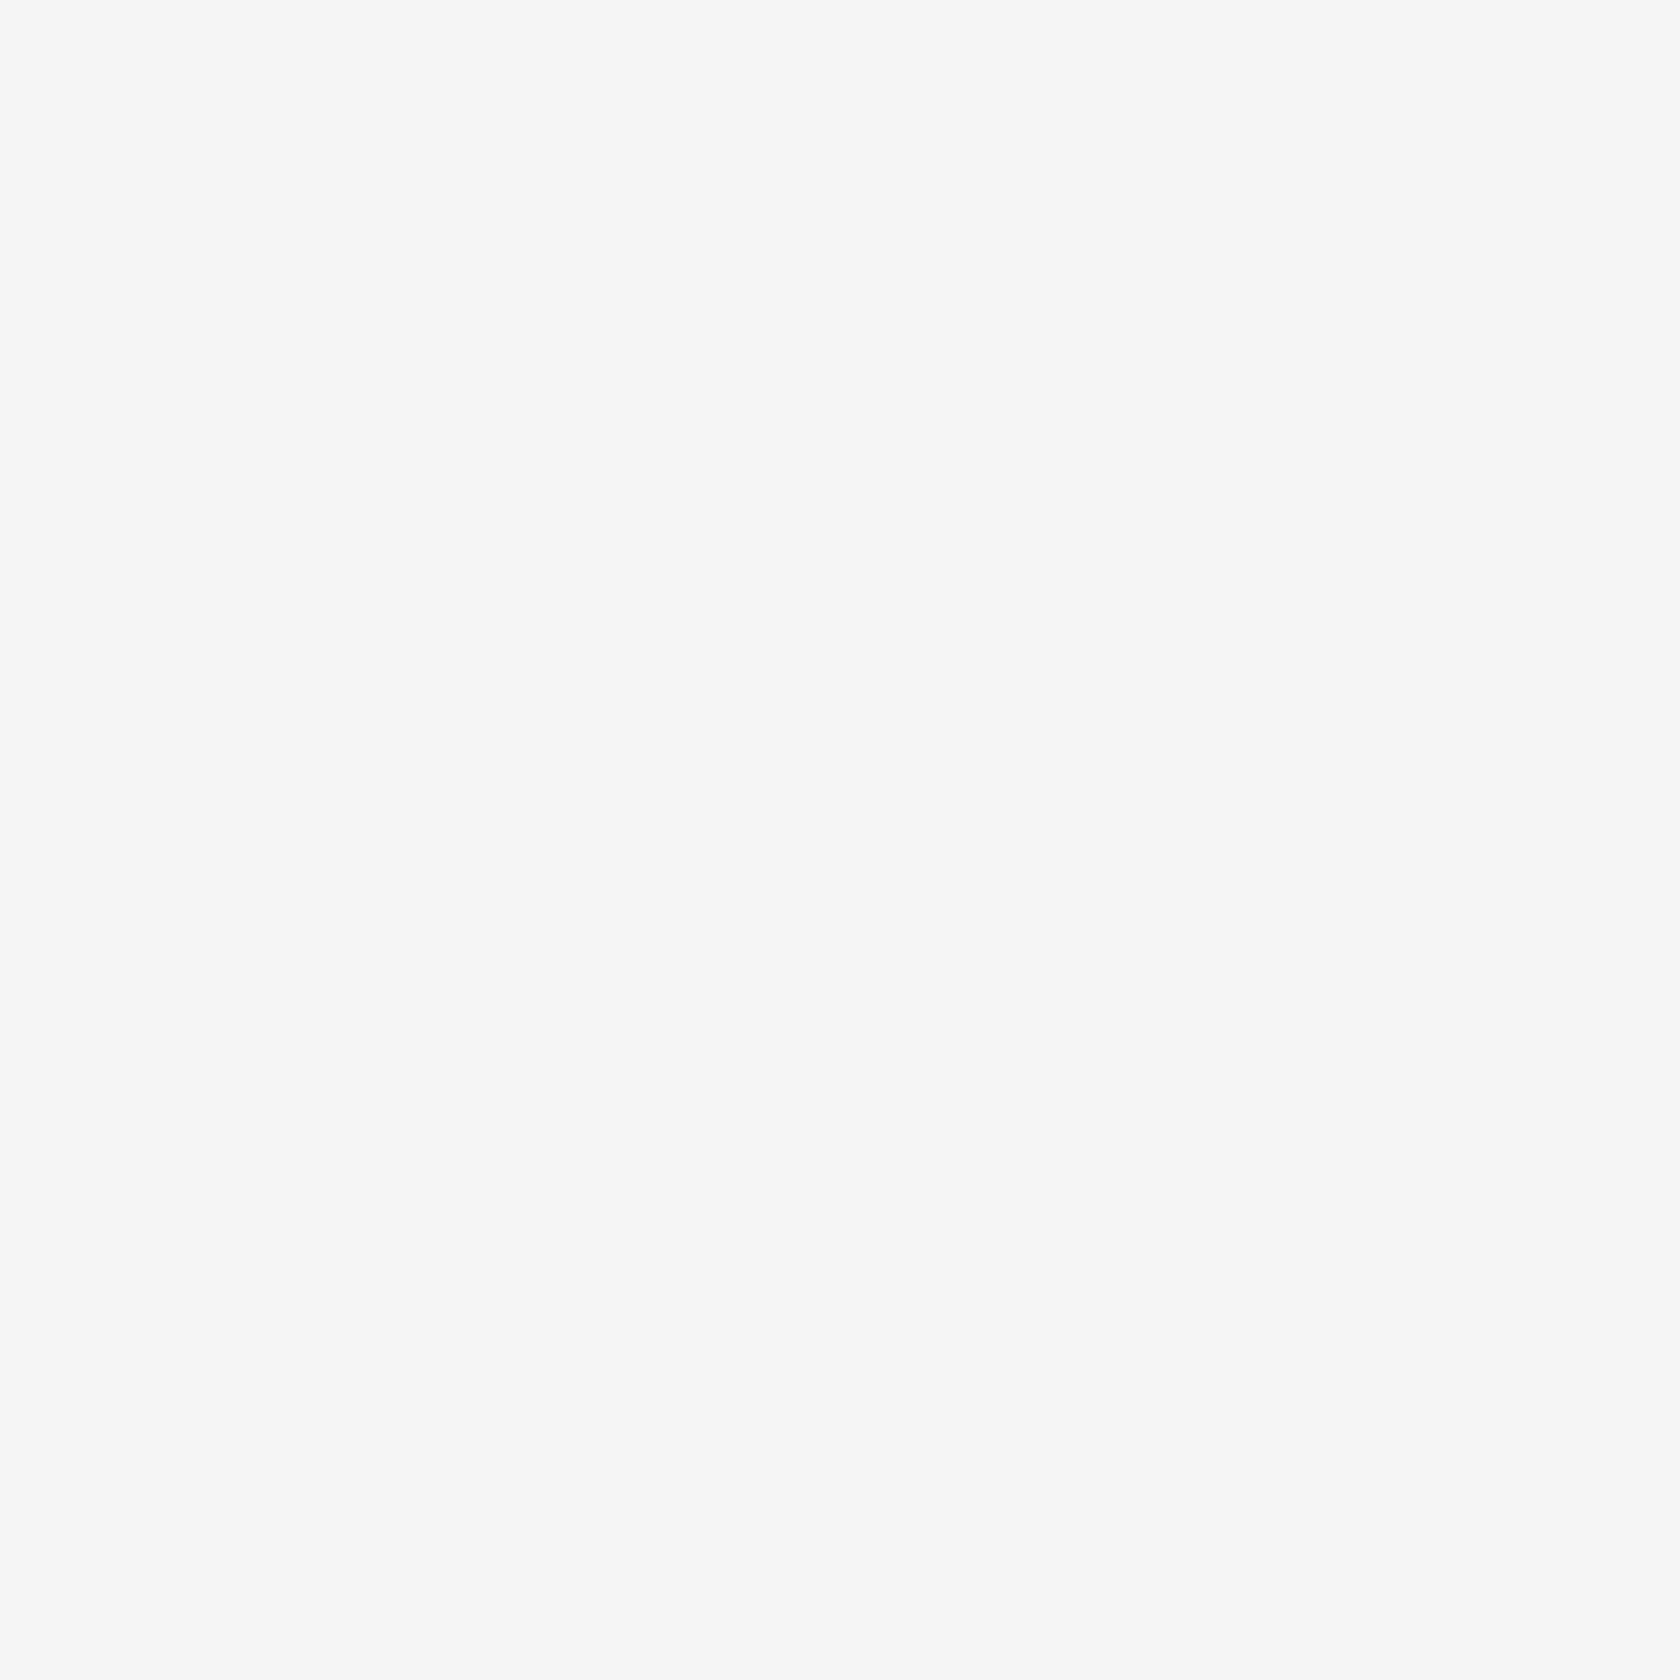 95c7e59ec64 Steve light messenger bag | Hermès